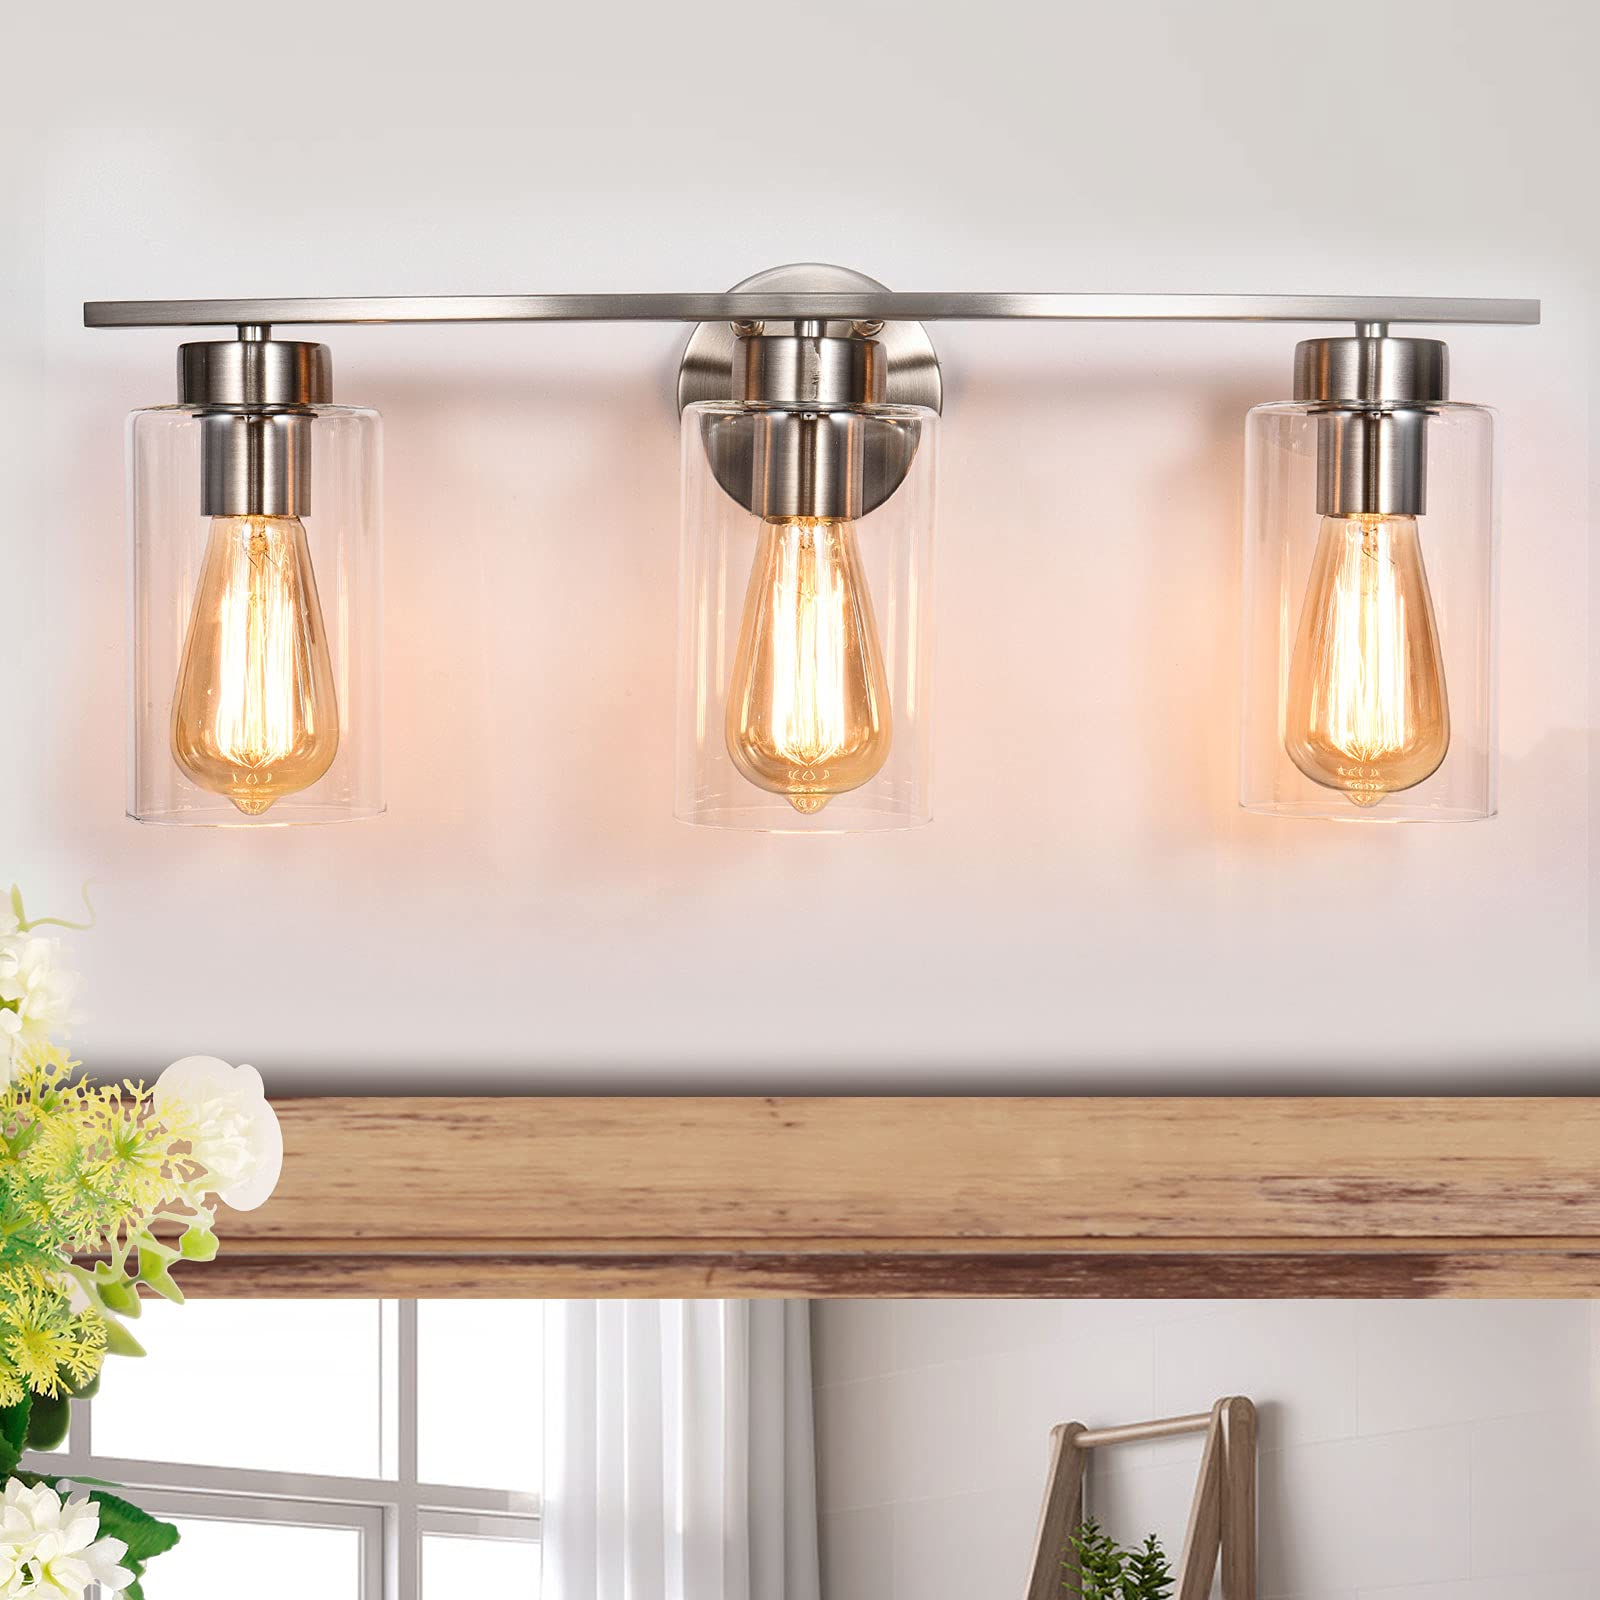 EDISLIVE 3-Light Bathroom Vanity Light Fixtures Nickel Wall Light Sconce with Clear